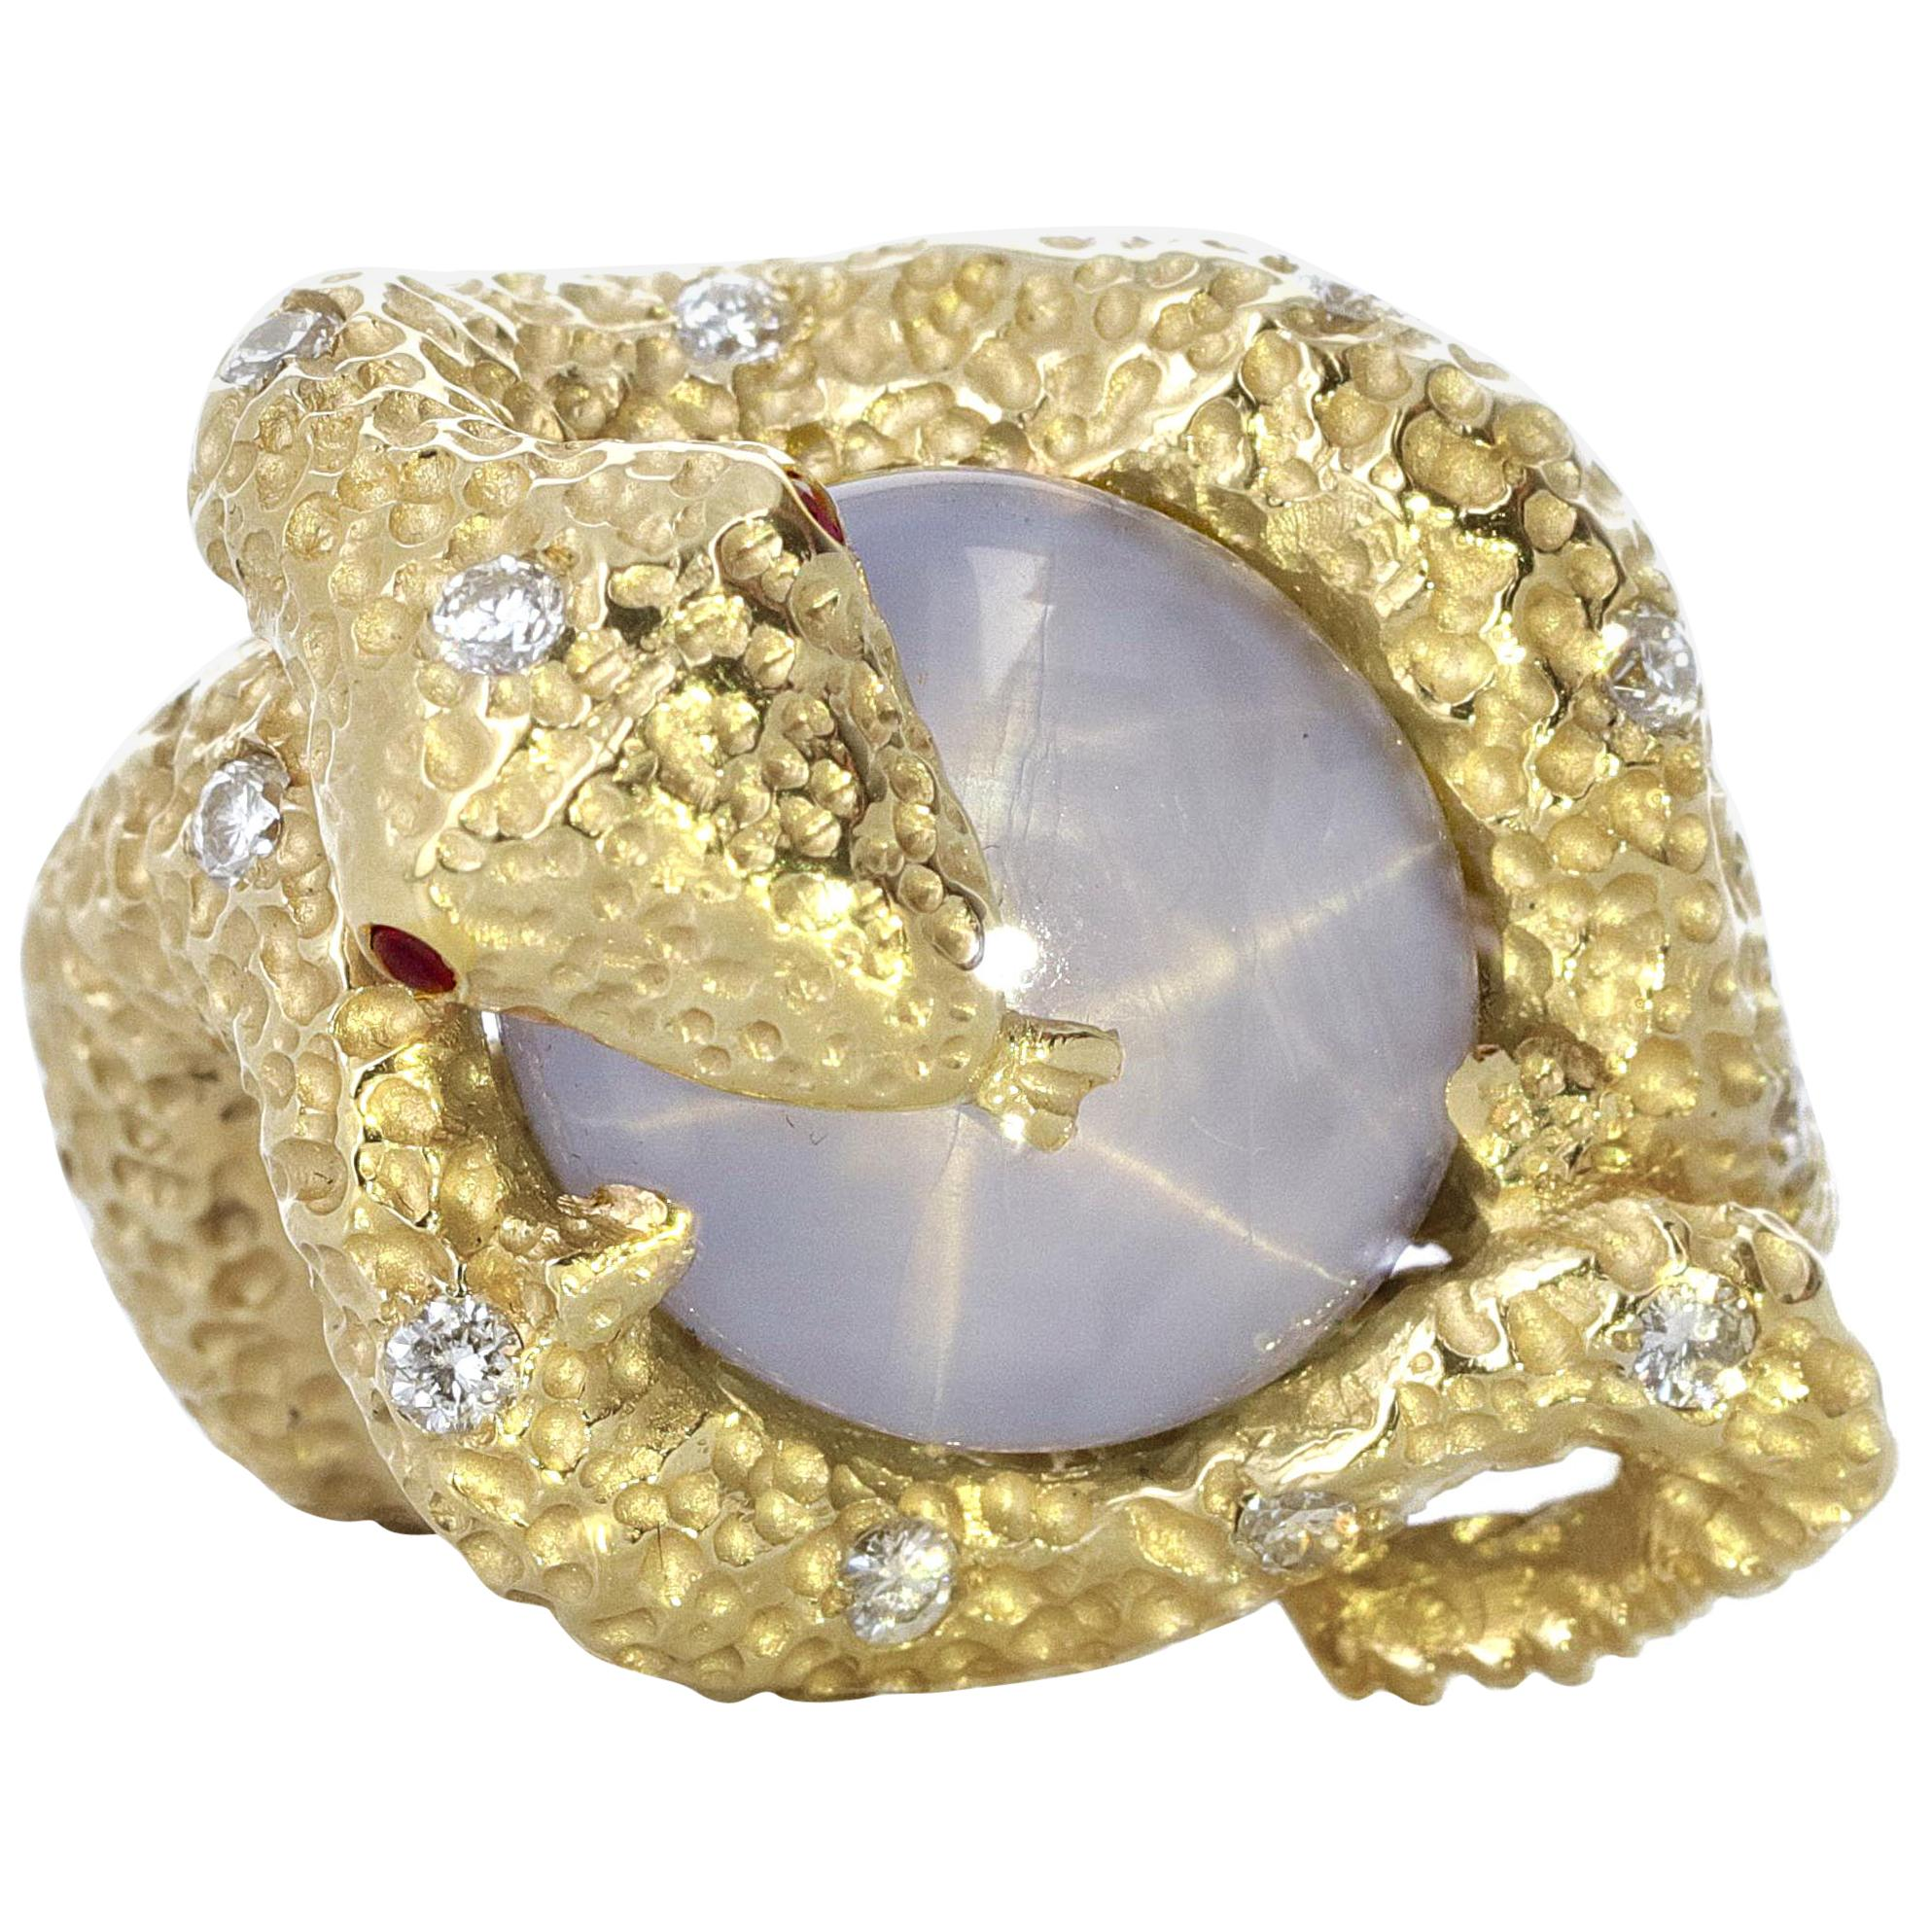 20.09 Carat Star Sapphire Snake Ring